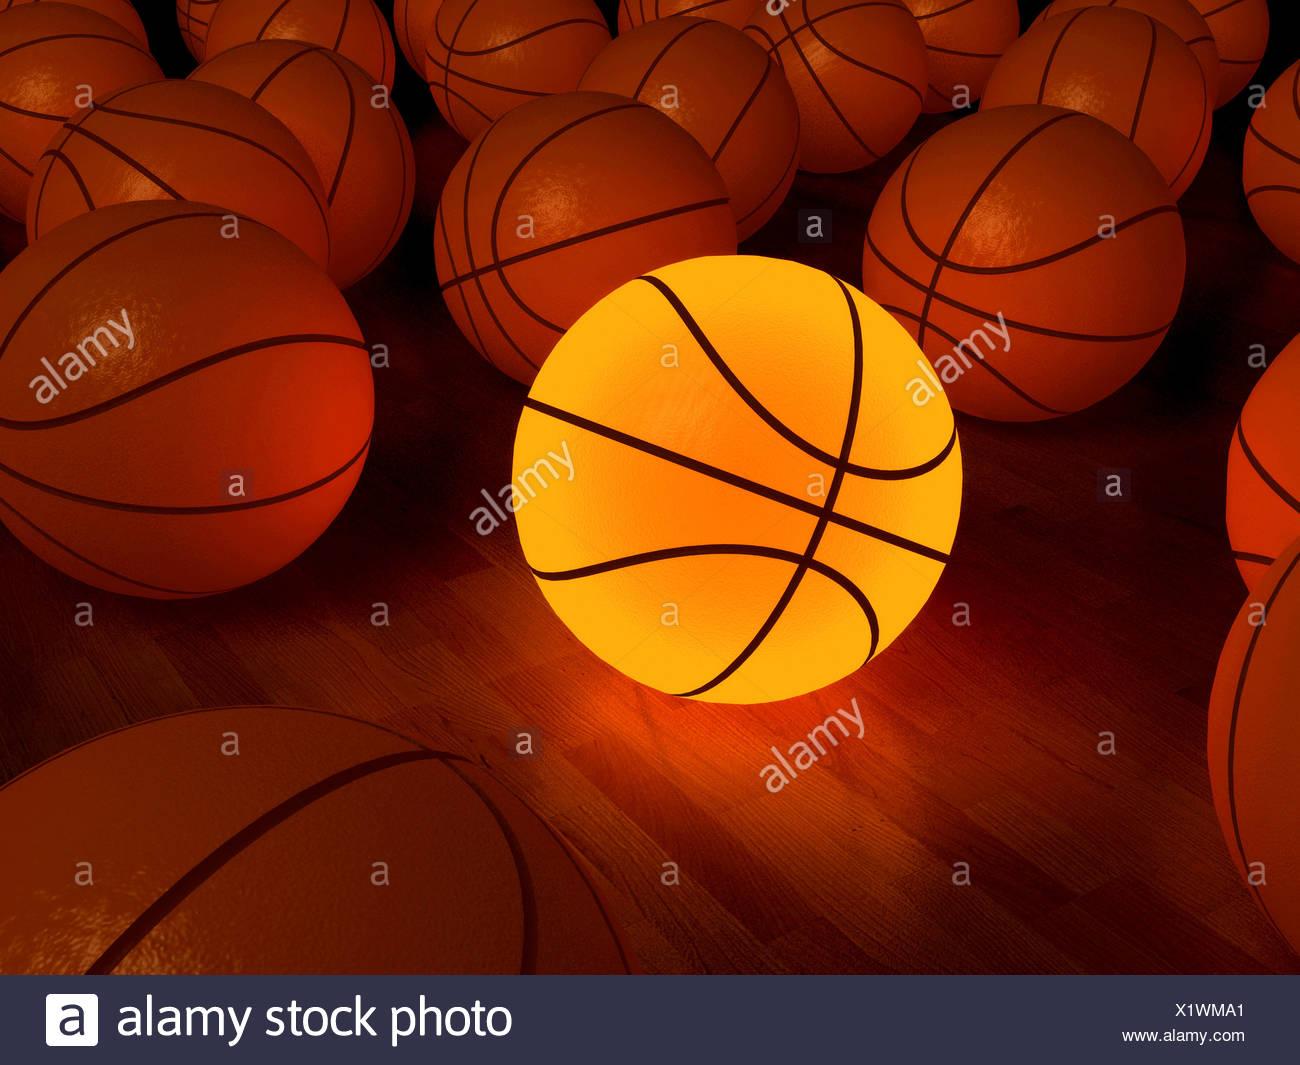 basketball glow game ball over the hardwood floor (3D) - Stock Image